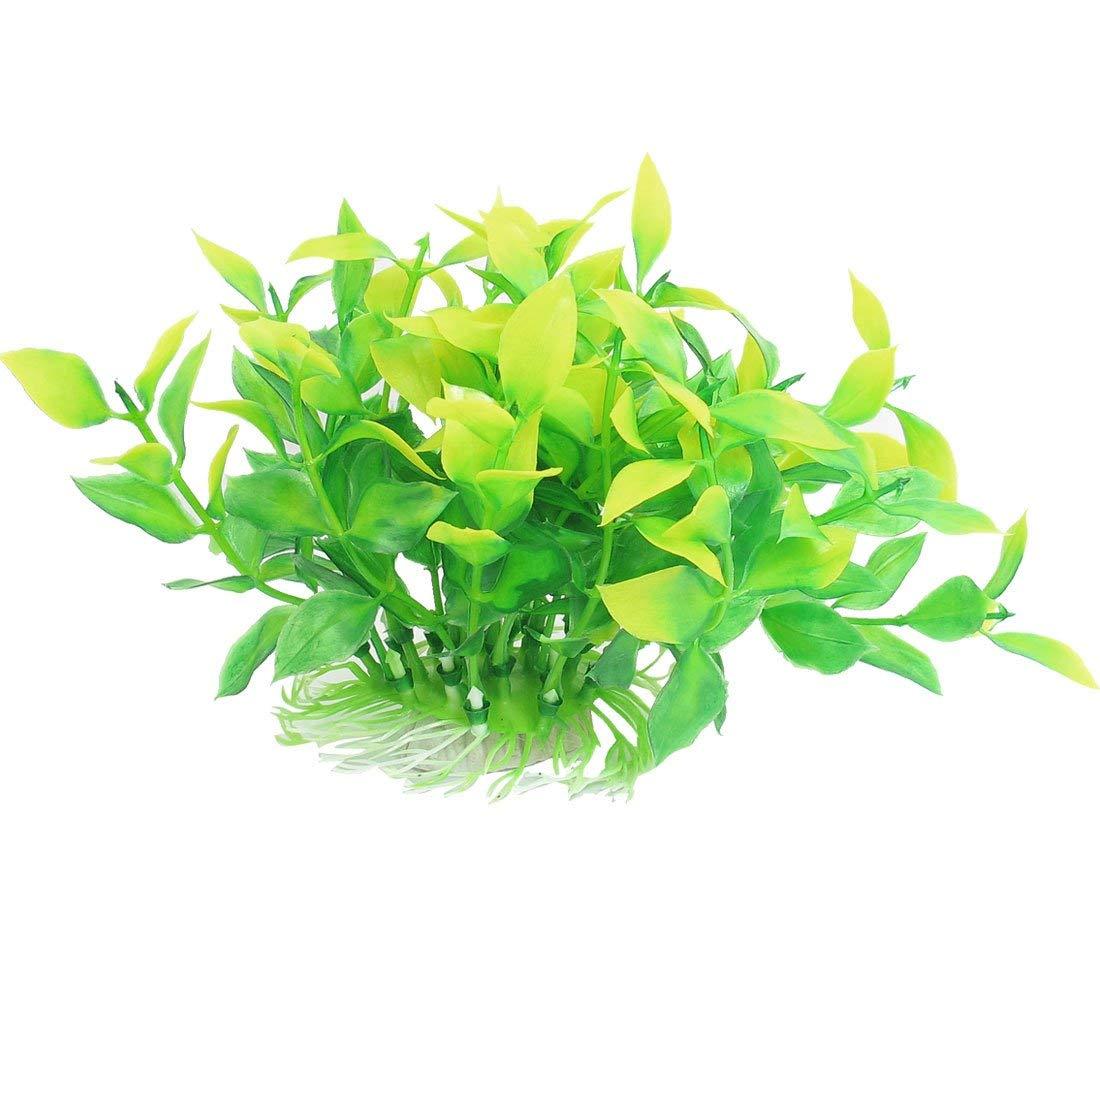 Uxcell Plastic Artificial Manmade Aquarium Decor Grass/Plant, 4.7-Inch, Green/Yellow